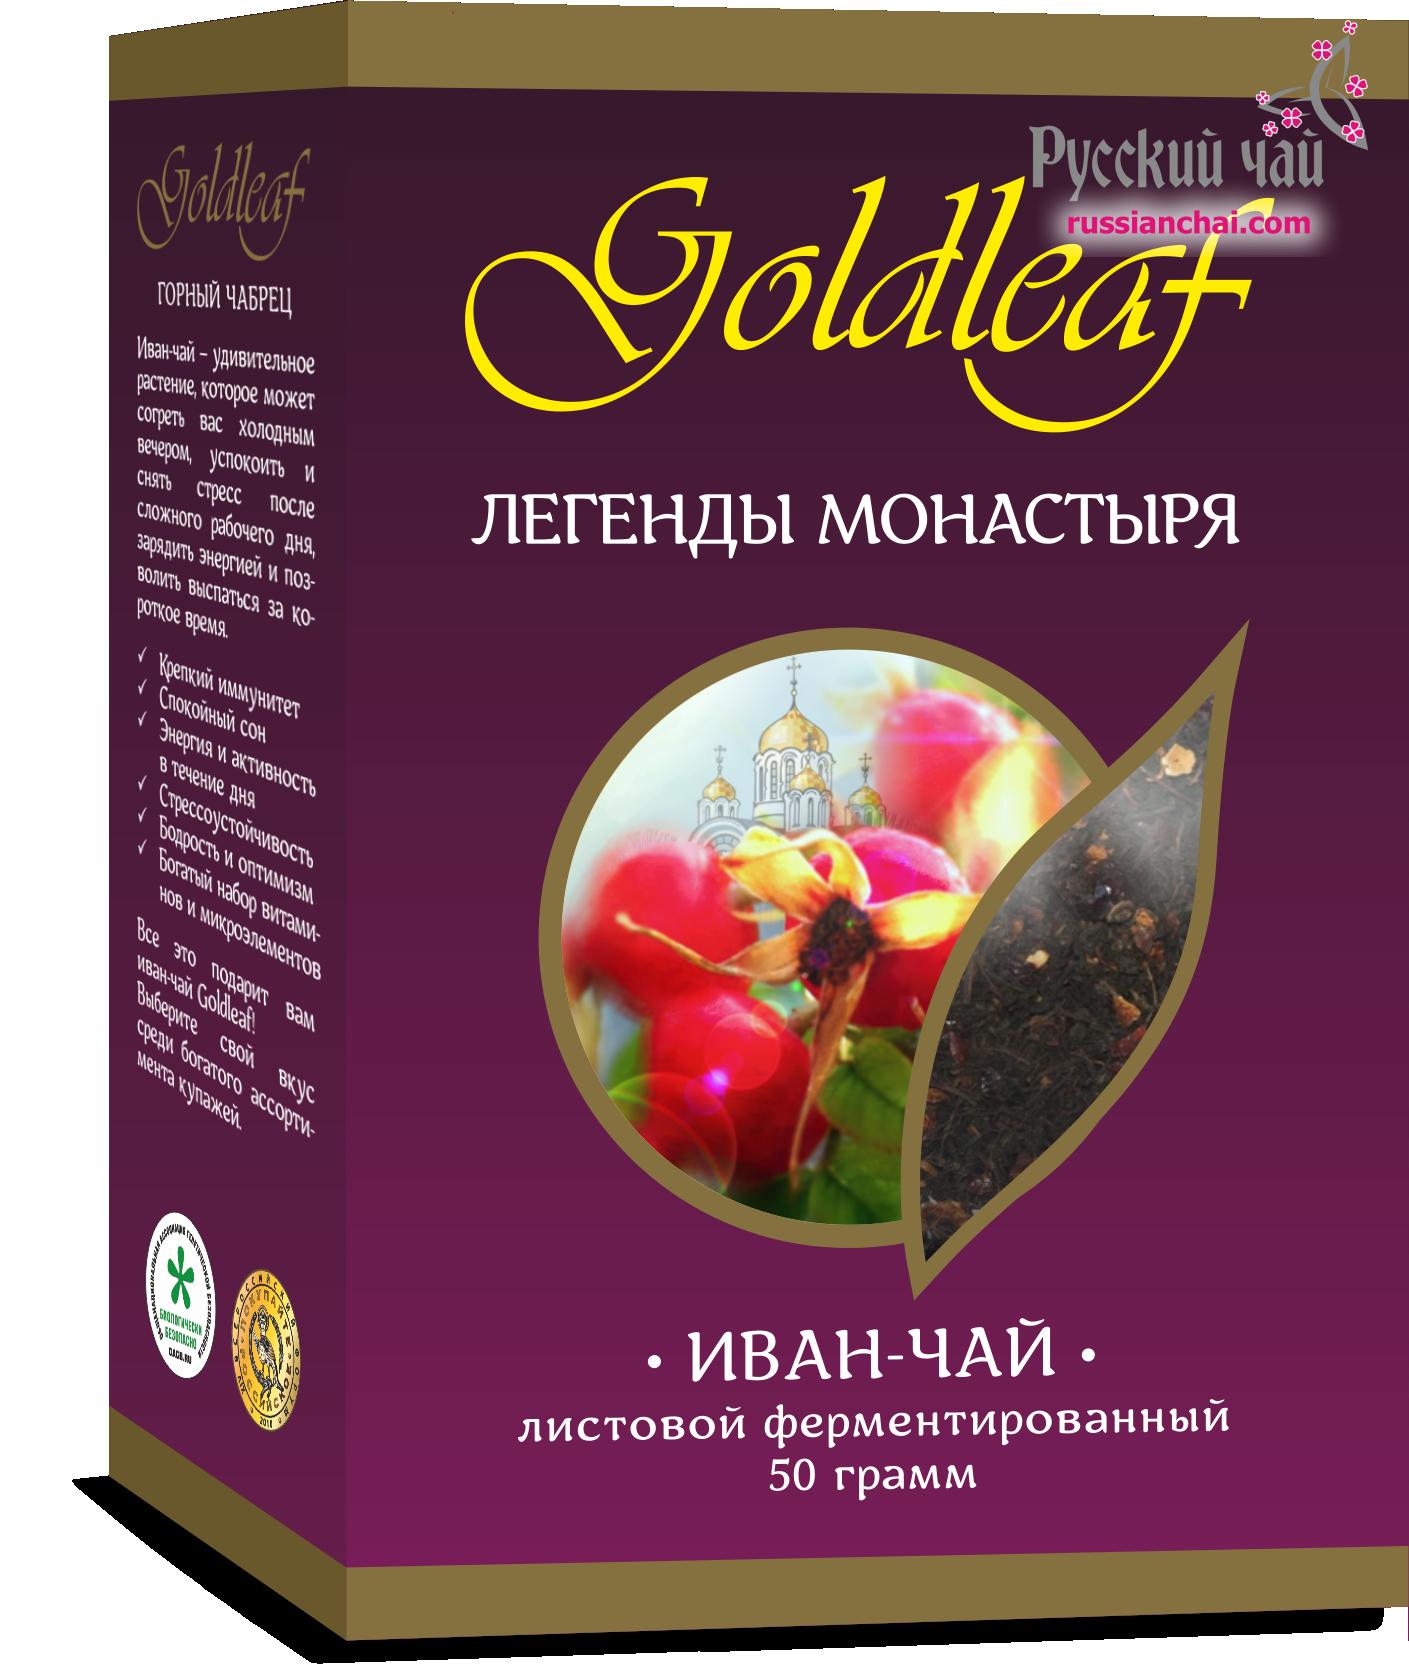 Иван-чай «Легенды монастыря»